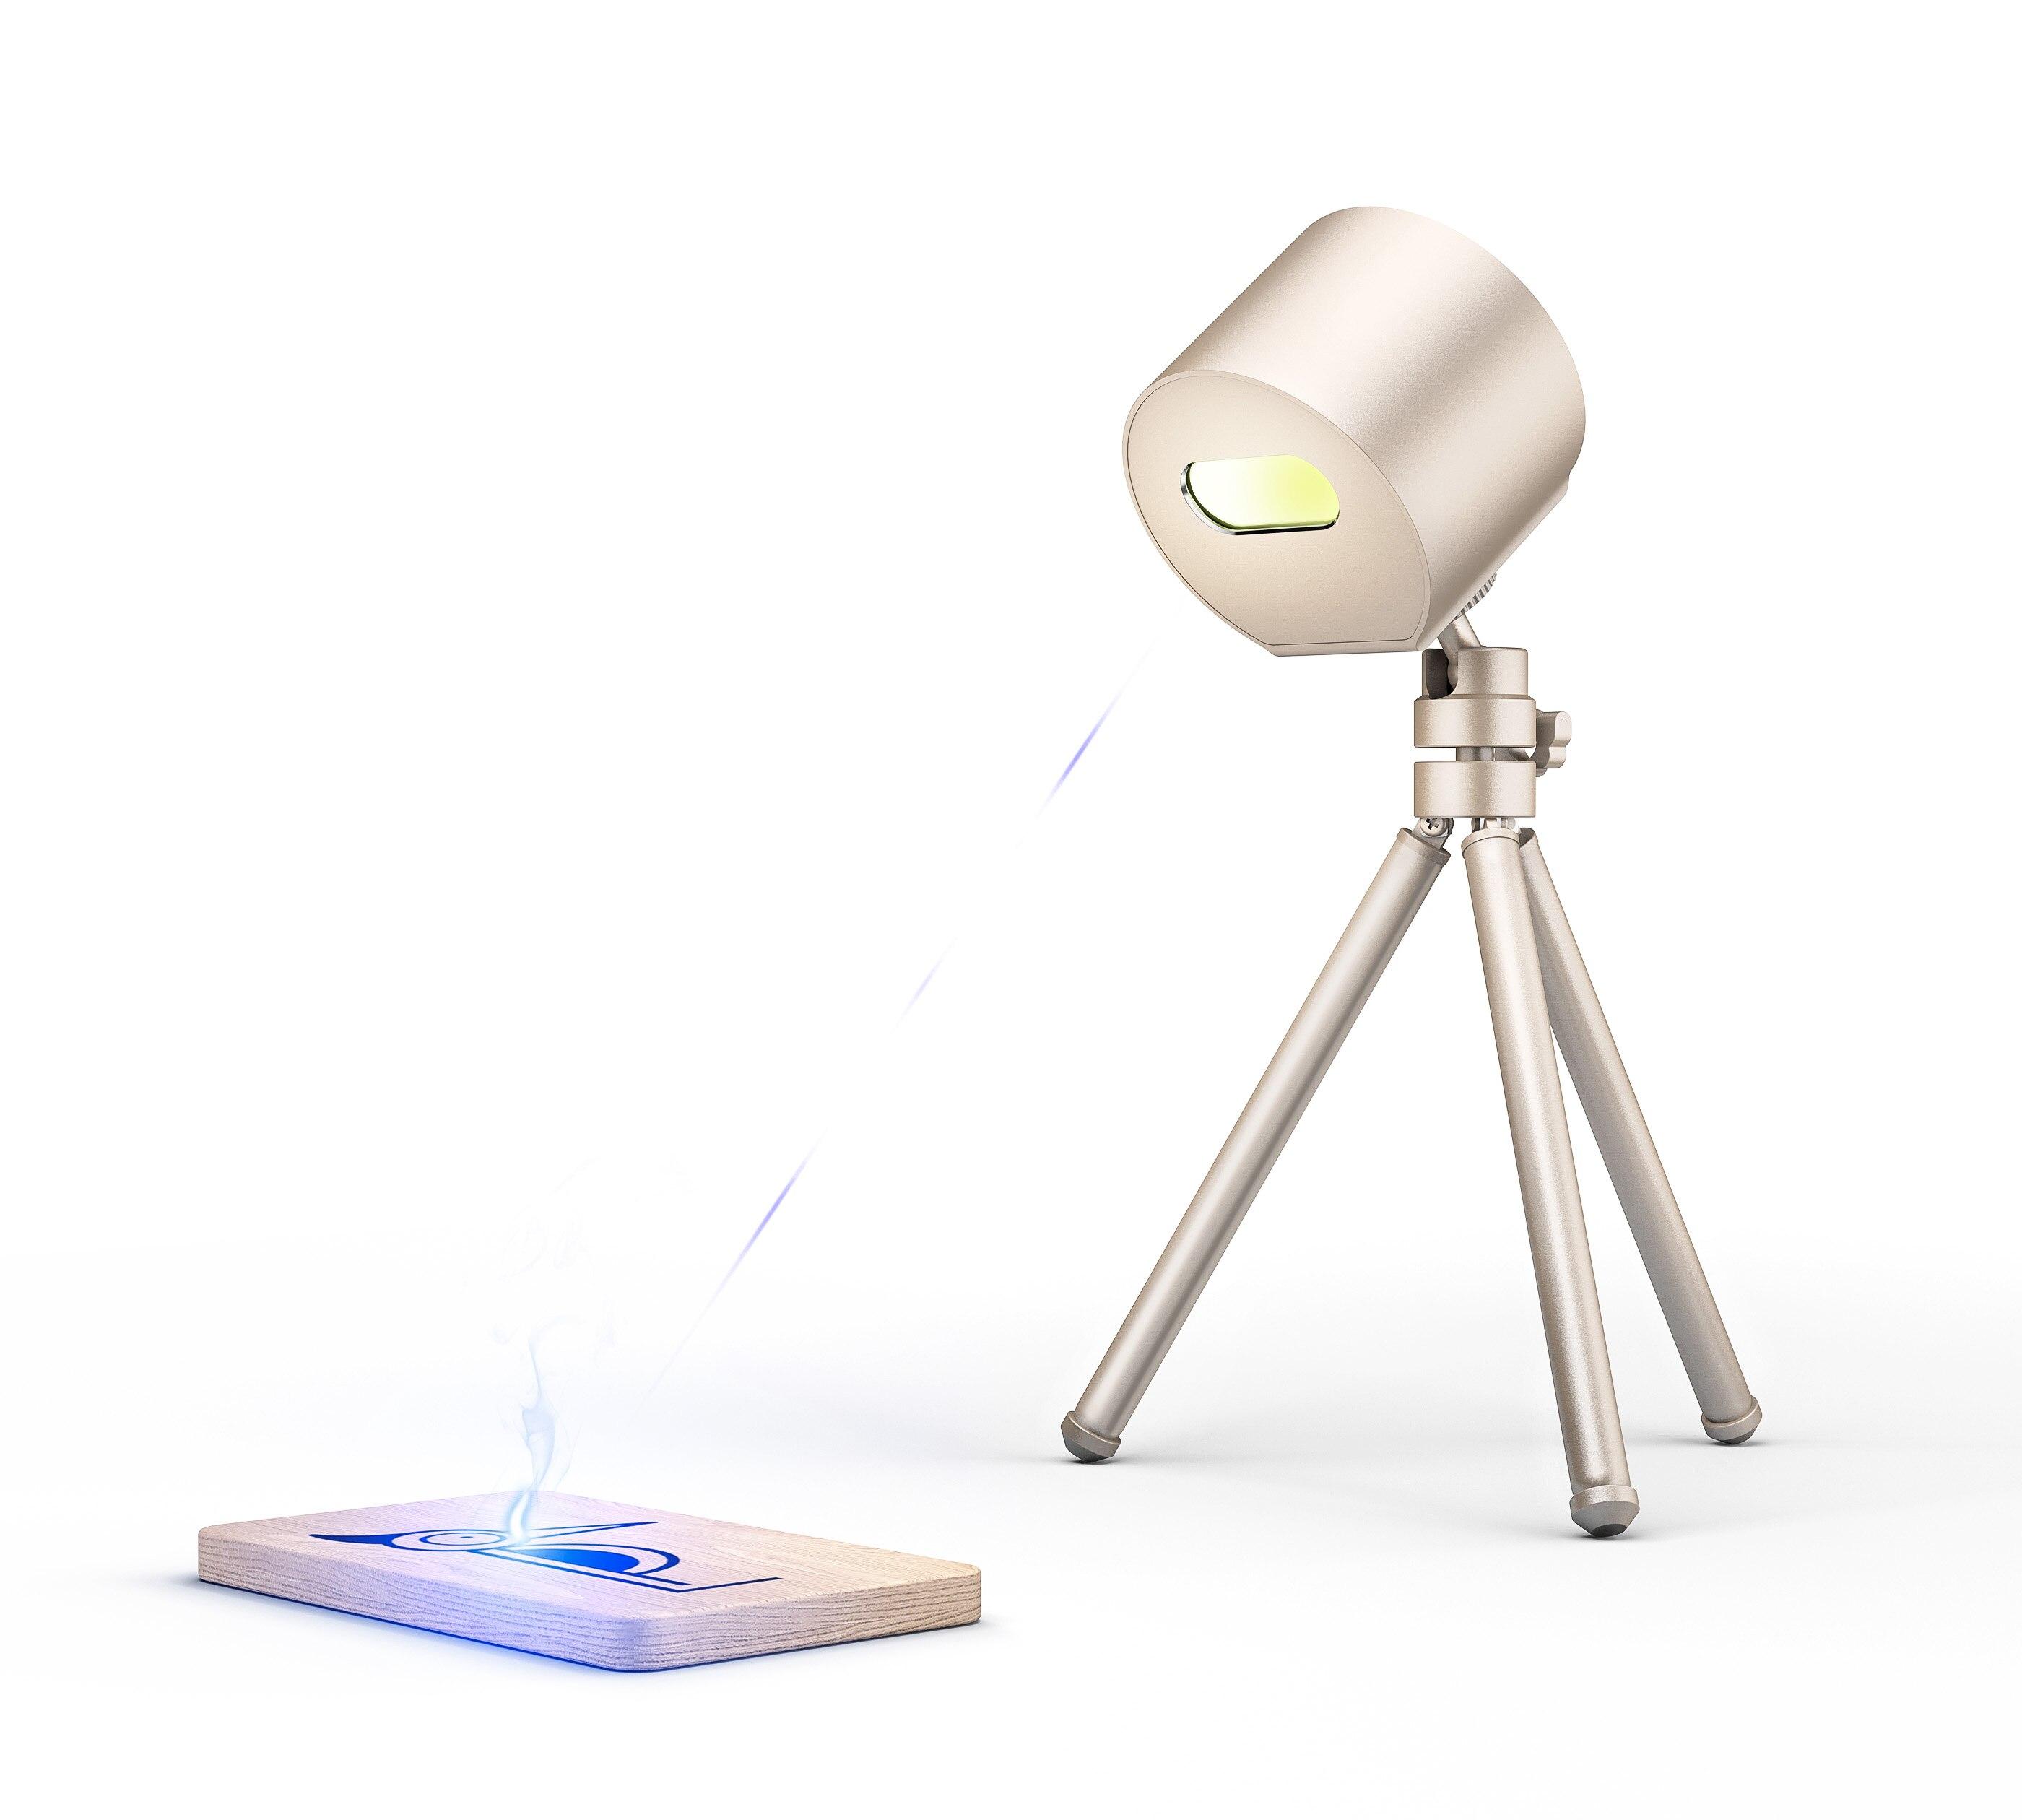 Creative Mini Laser Engraver Diy Portable Adjustable Laser Engraving Machine for Leather Wood Plastic Paper Mobile Phone APP